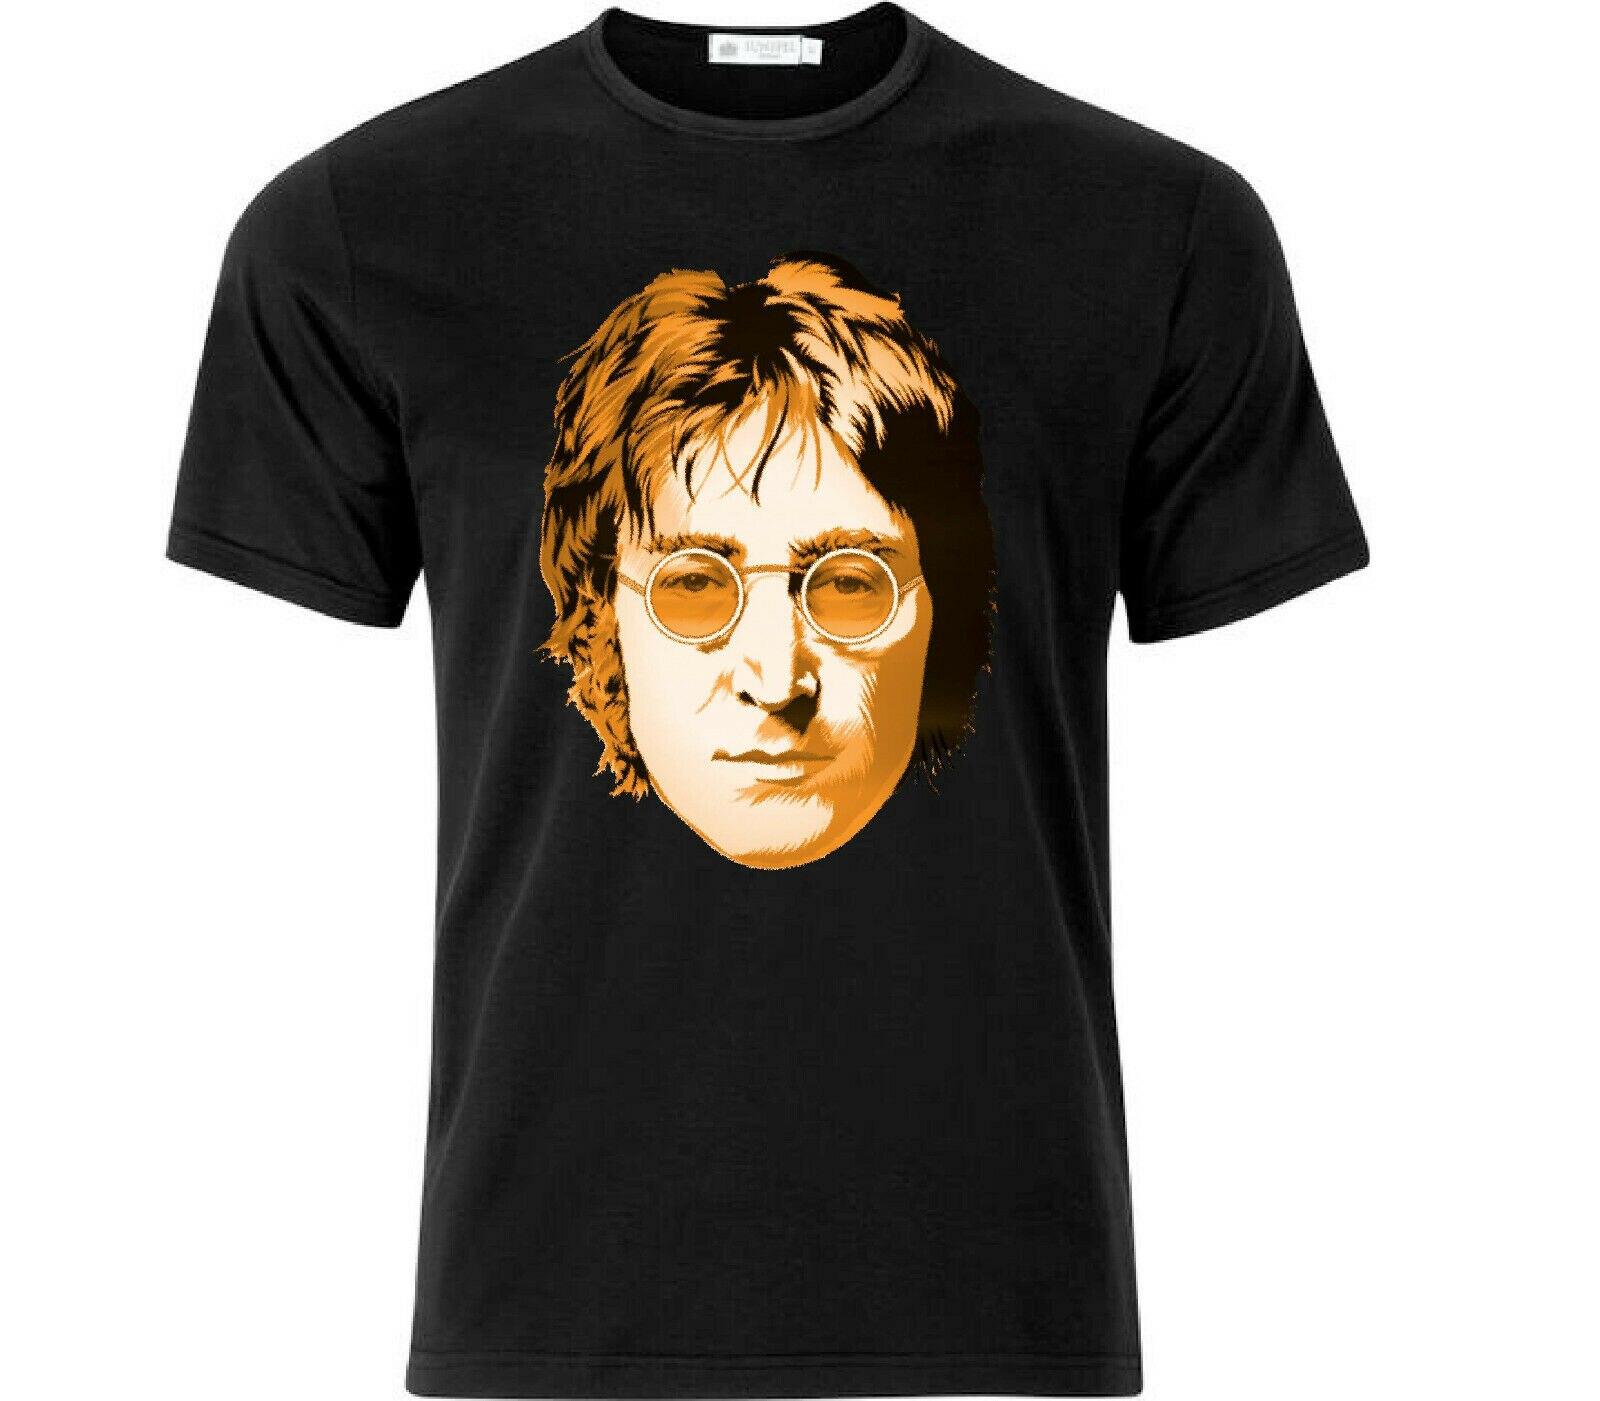 Camiseta negra de John Lennon icónico